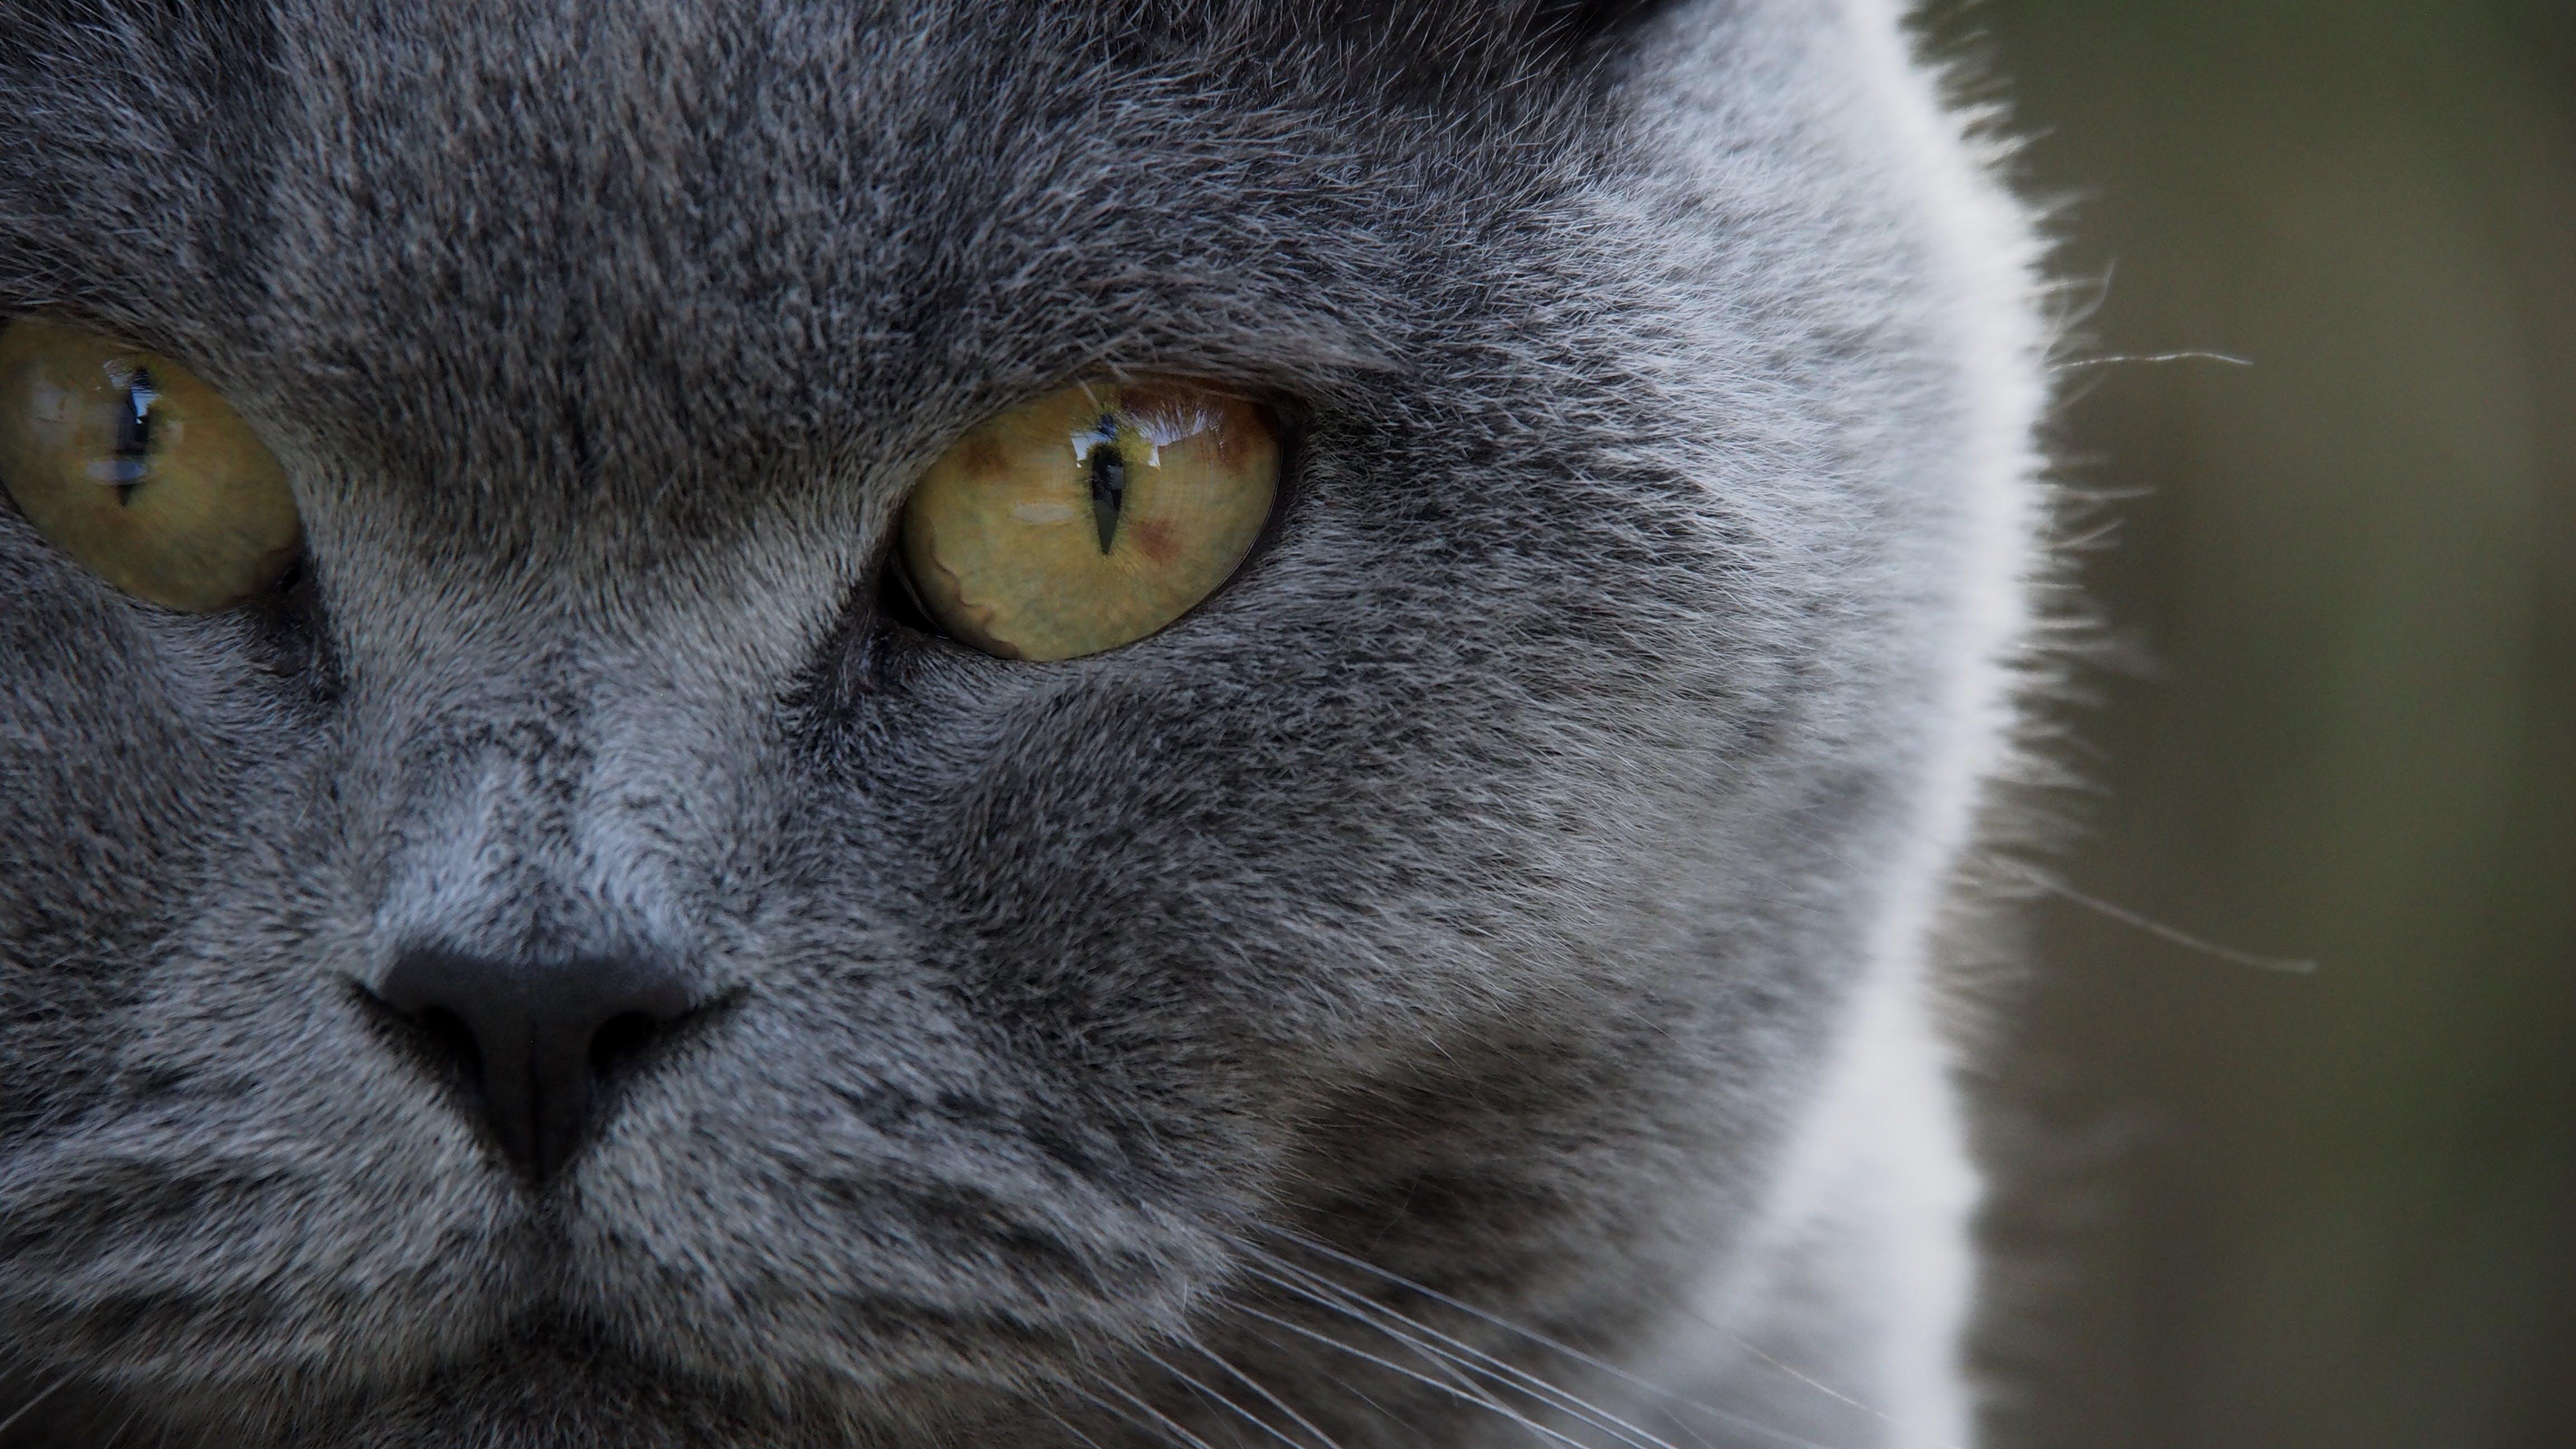 Shallow Focus of Gray Tabby Cat